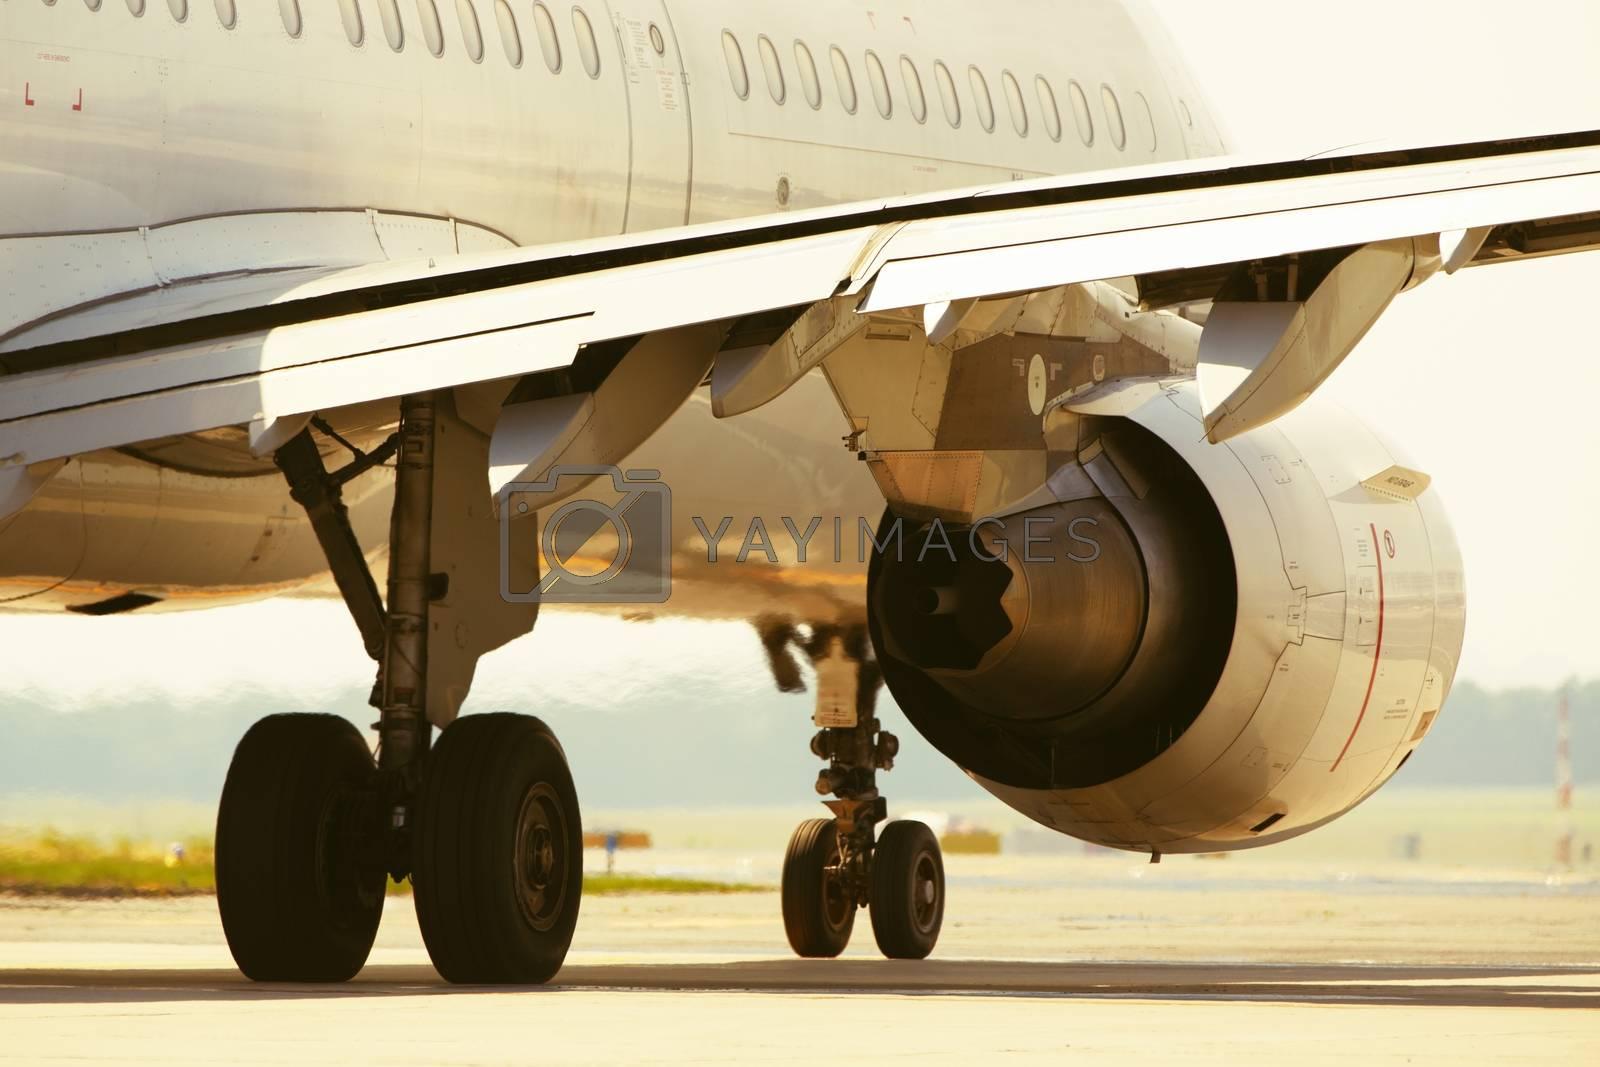 Hot air behind the aircraft engine - selective focus